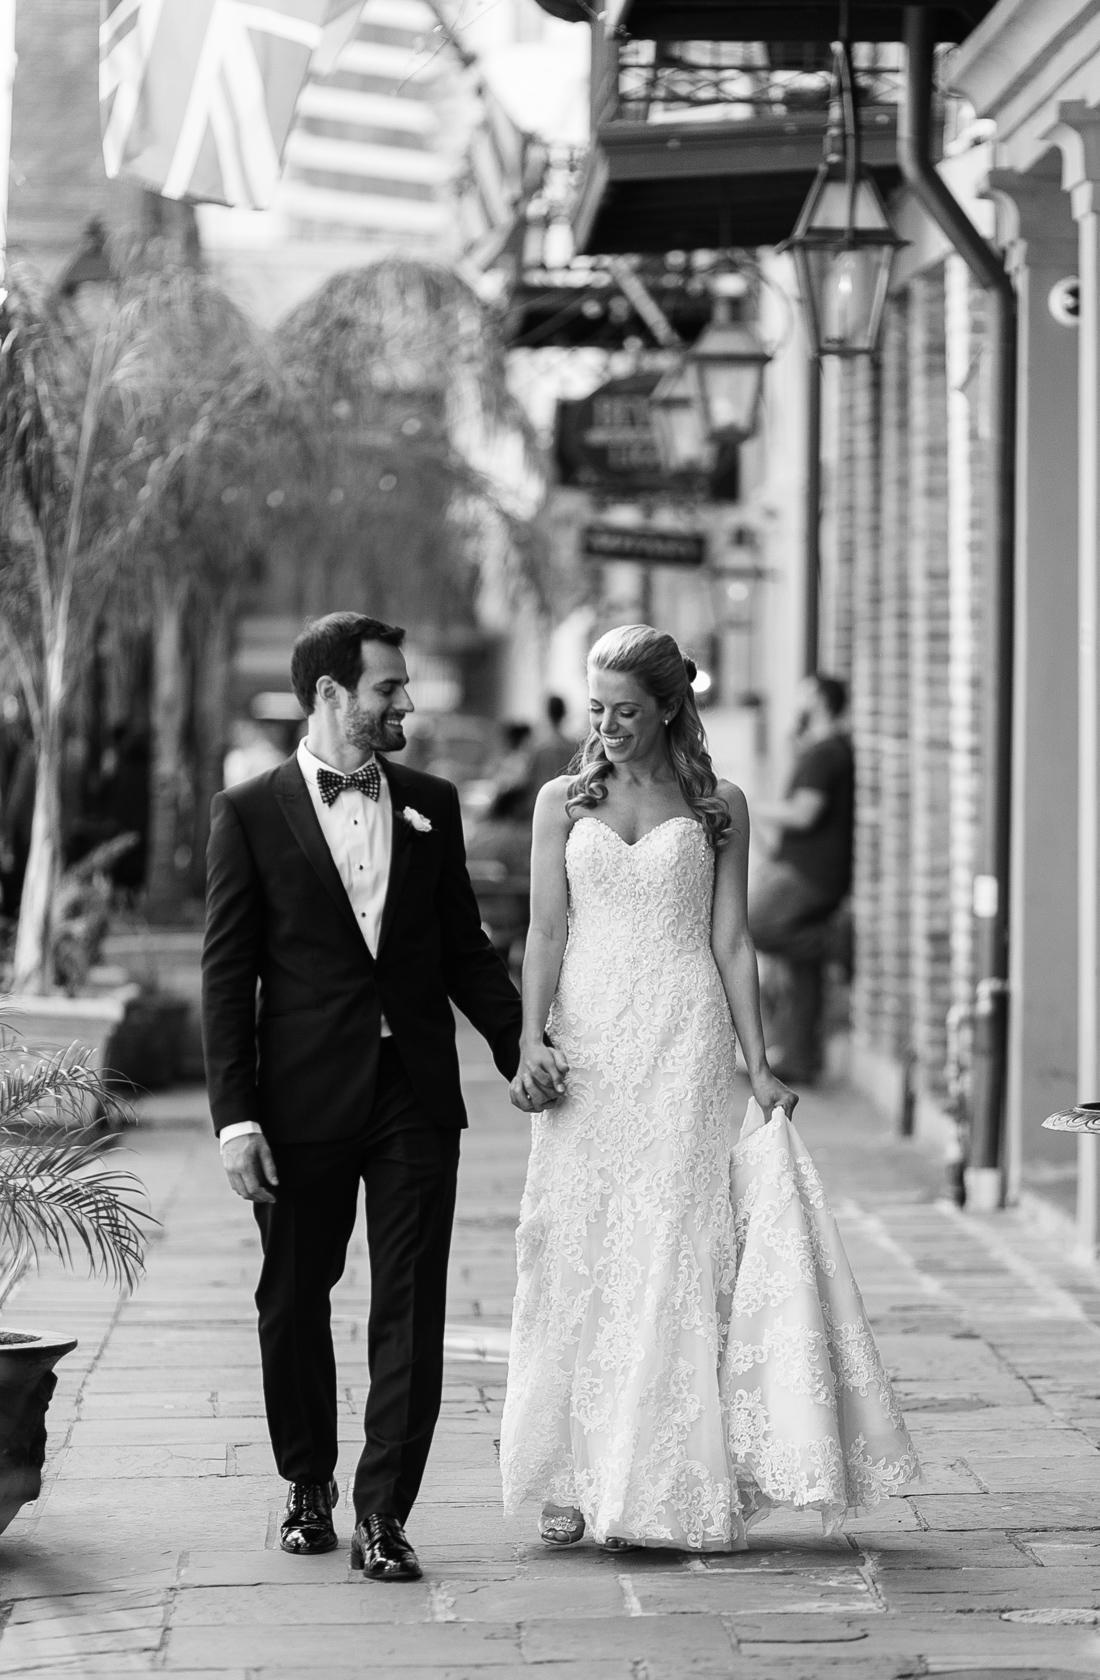 omni royal orleans wedding bride and groom walking in quarter